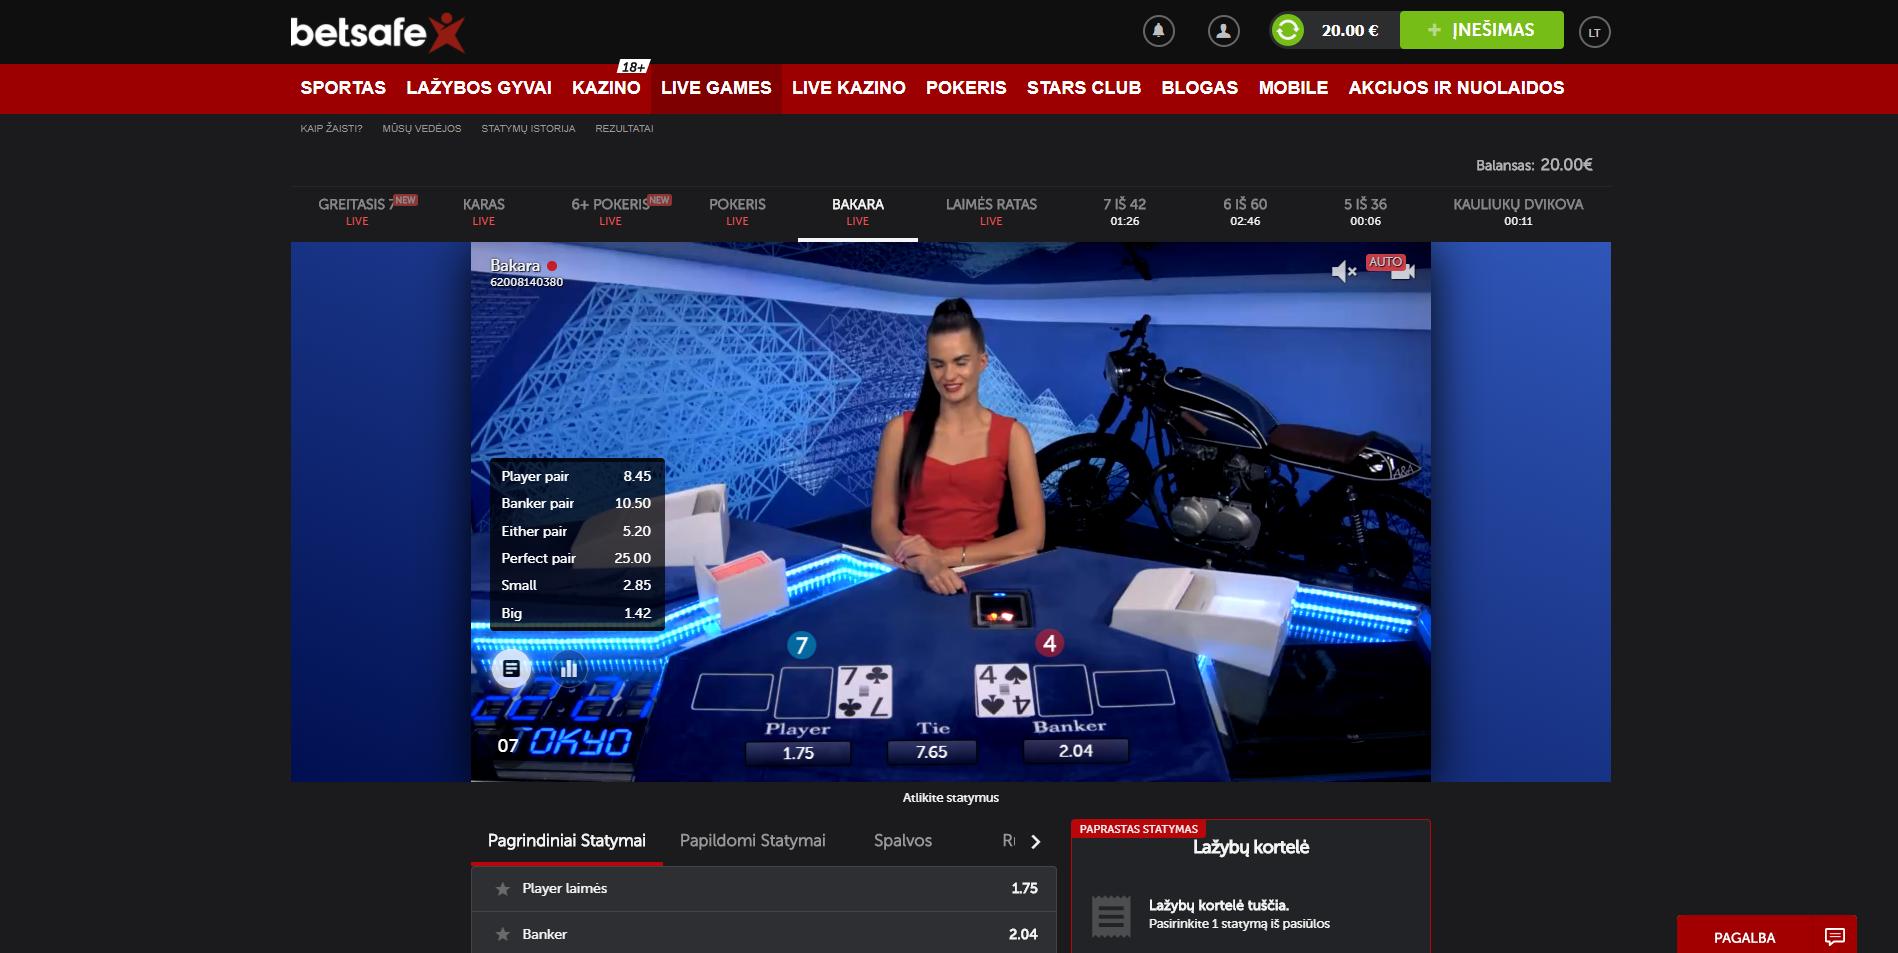 betsafe kazino betgames.tv bakara pokeris